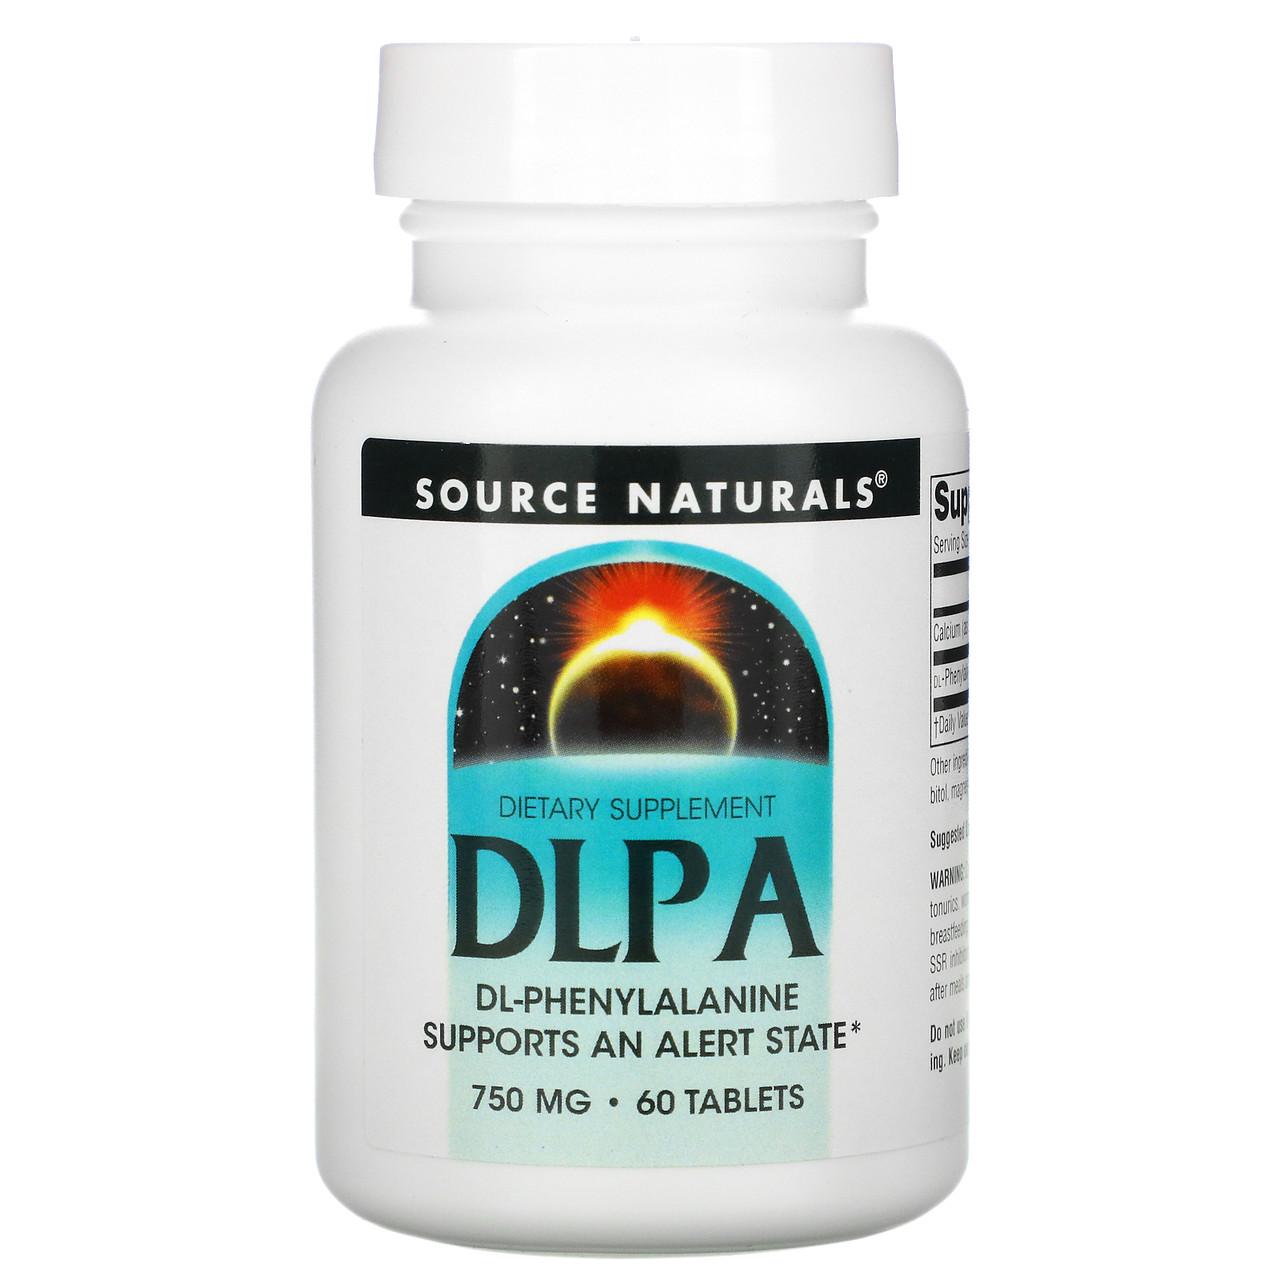 DL-Фенилаланин, DLPA, Source Naturals, 750 мг, 60 таблеток.